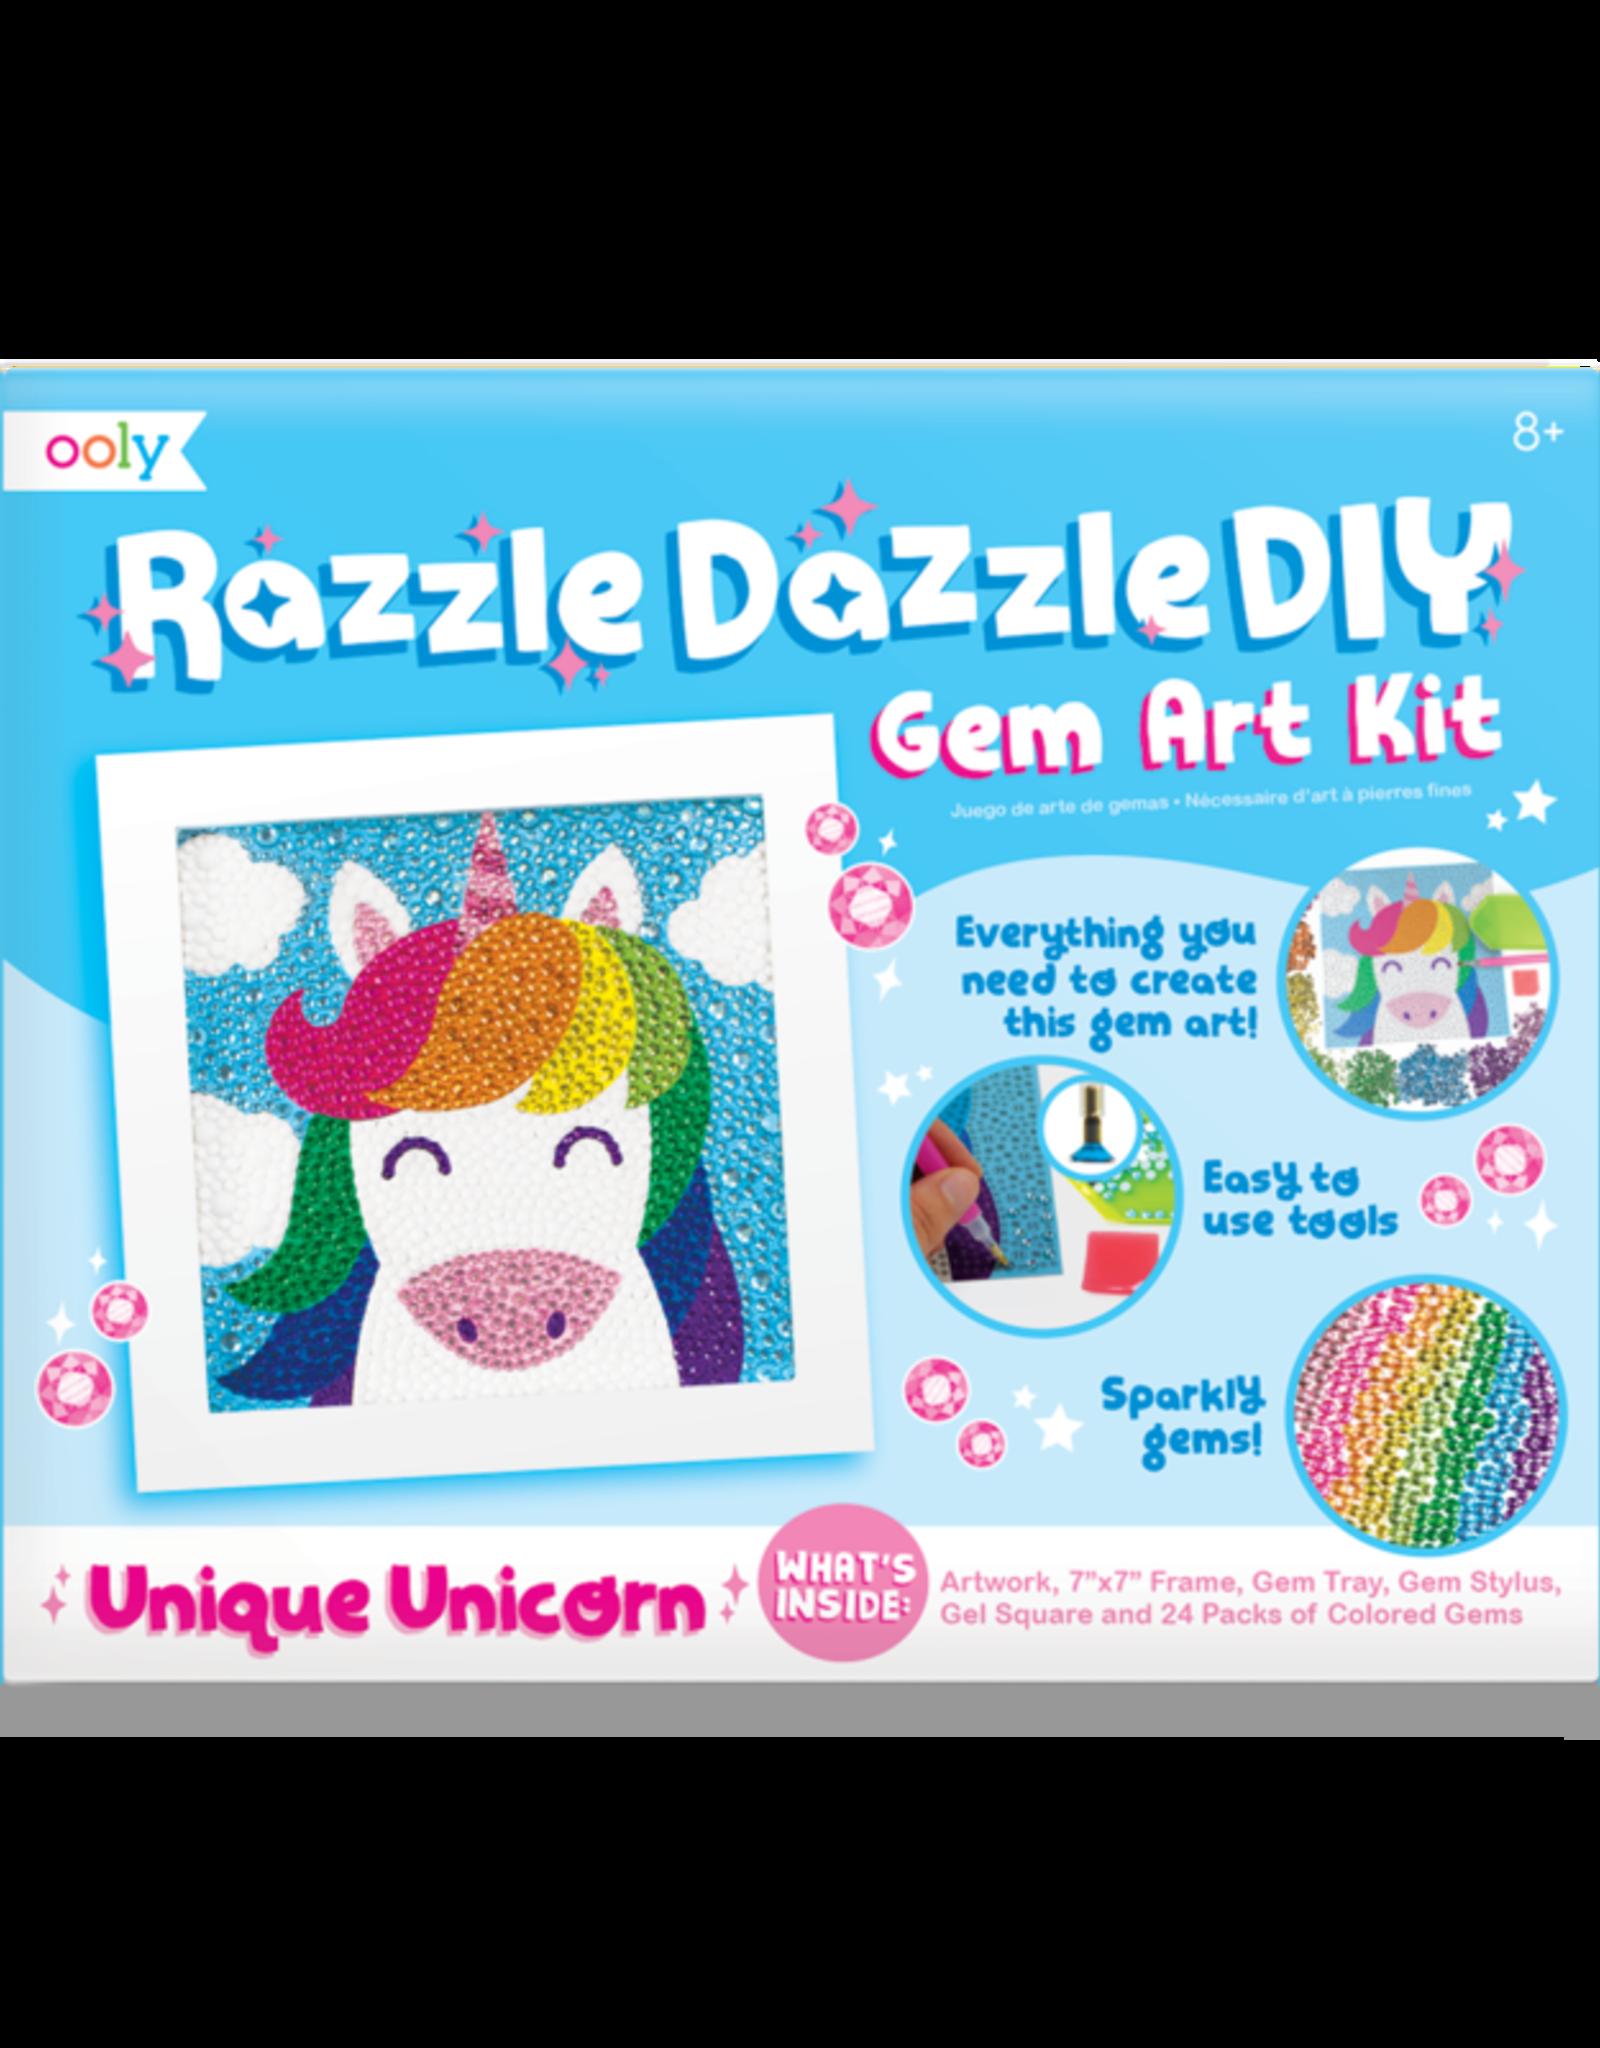 Ooly Razzle Dazzle DIY Gem Art Kit - Unique Unicorn